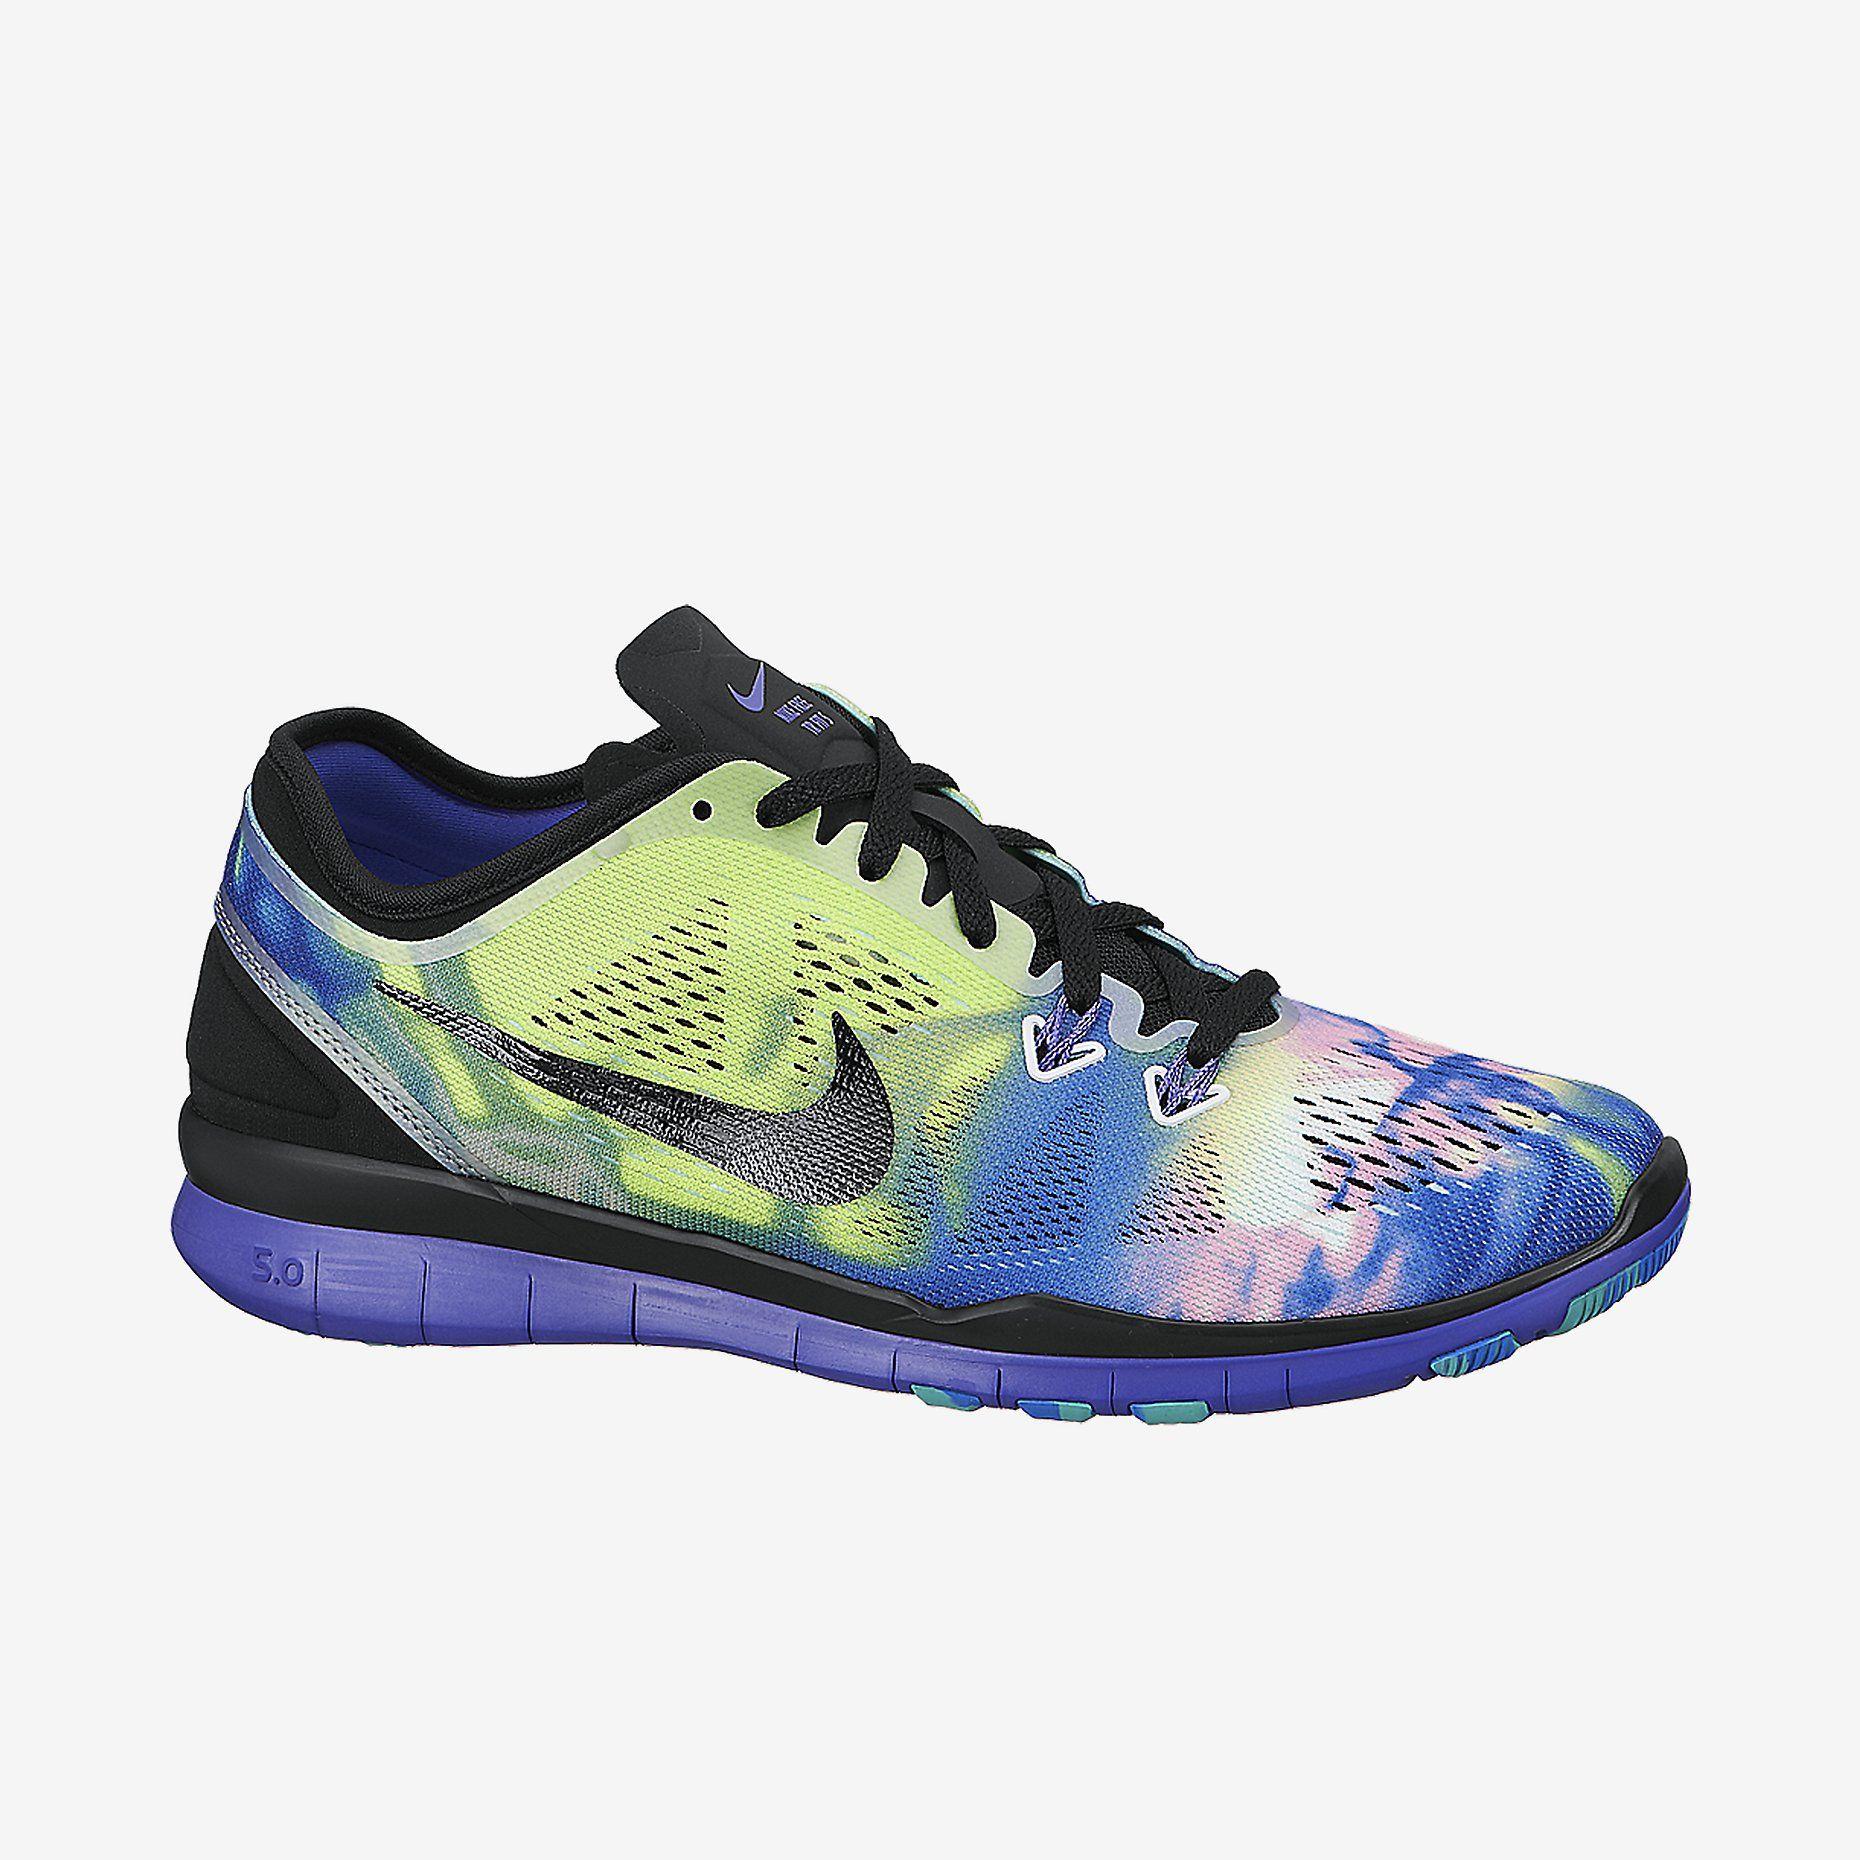 new arrival f5980 a40b3 Nike Free TR 5 Print Women s Training Shoe.